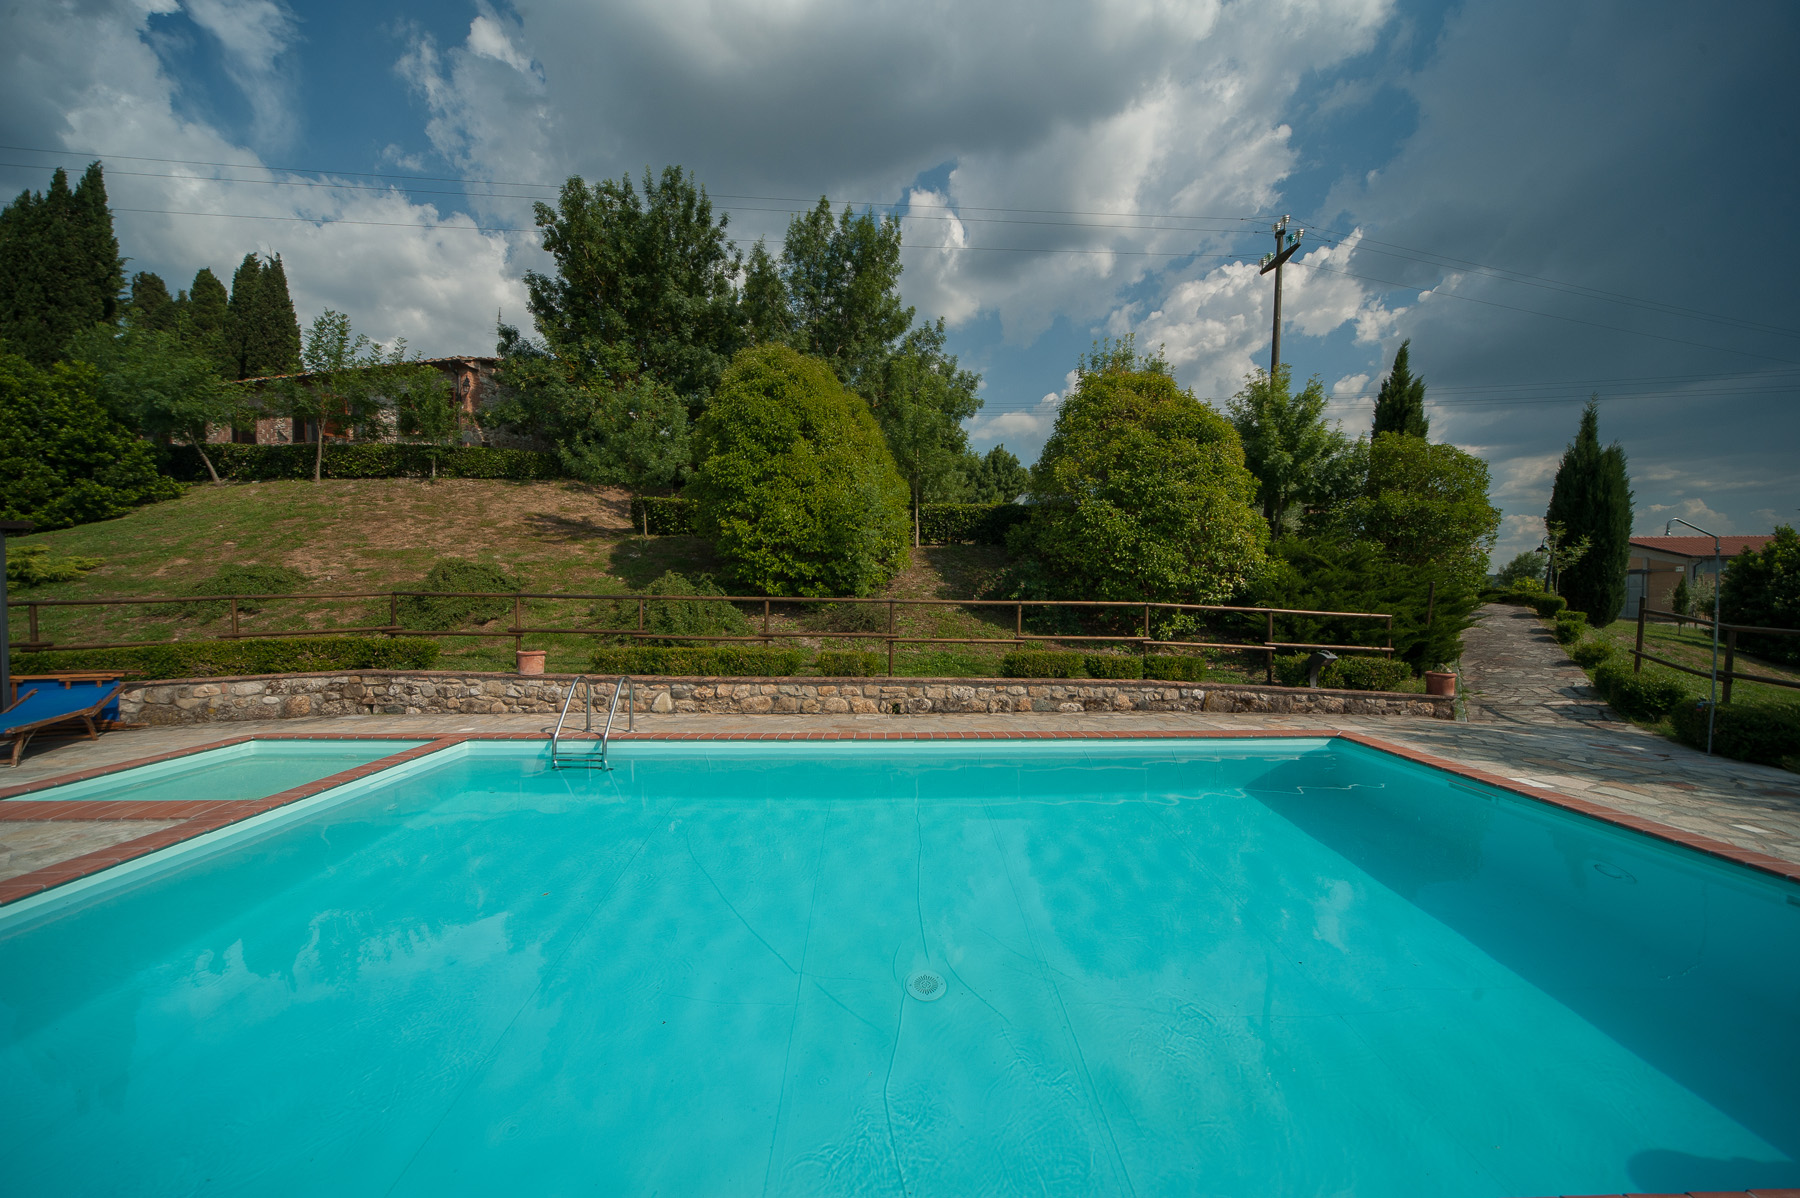 Agriturismo la mirandola agriturismo per bambini in - Agriturismo toscana bambini piscina coperta ...